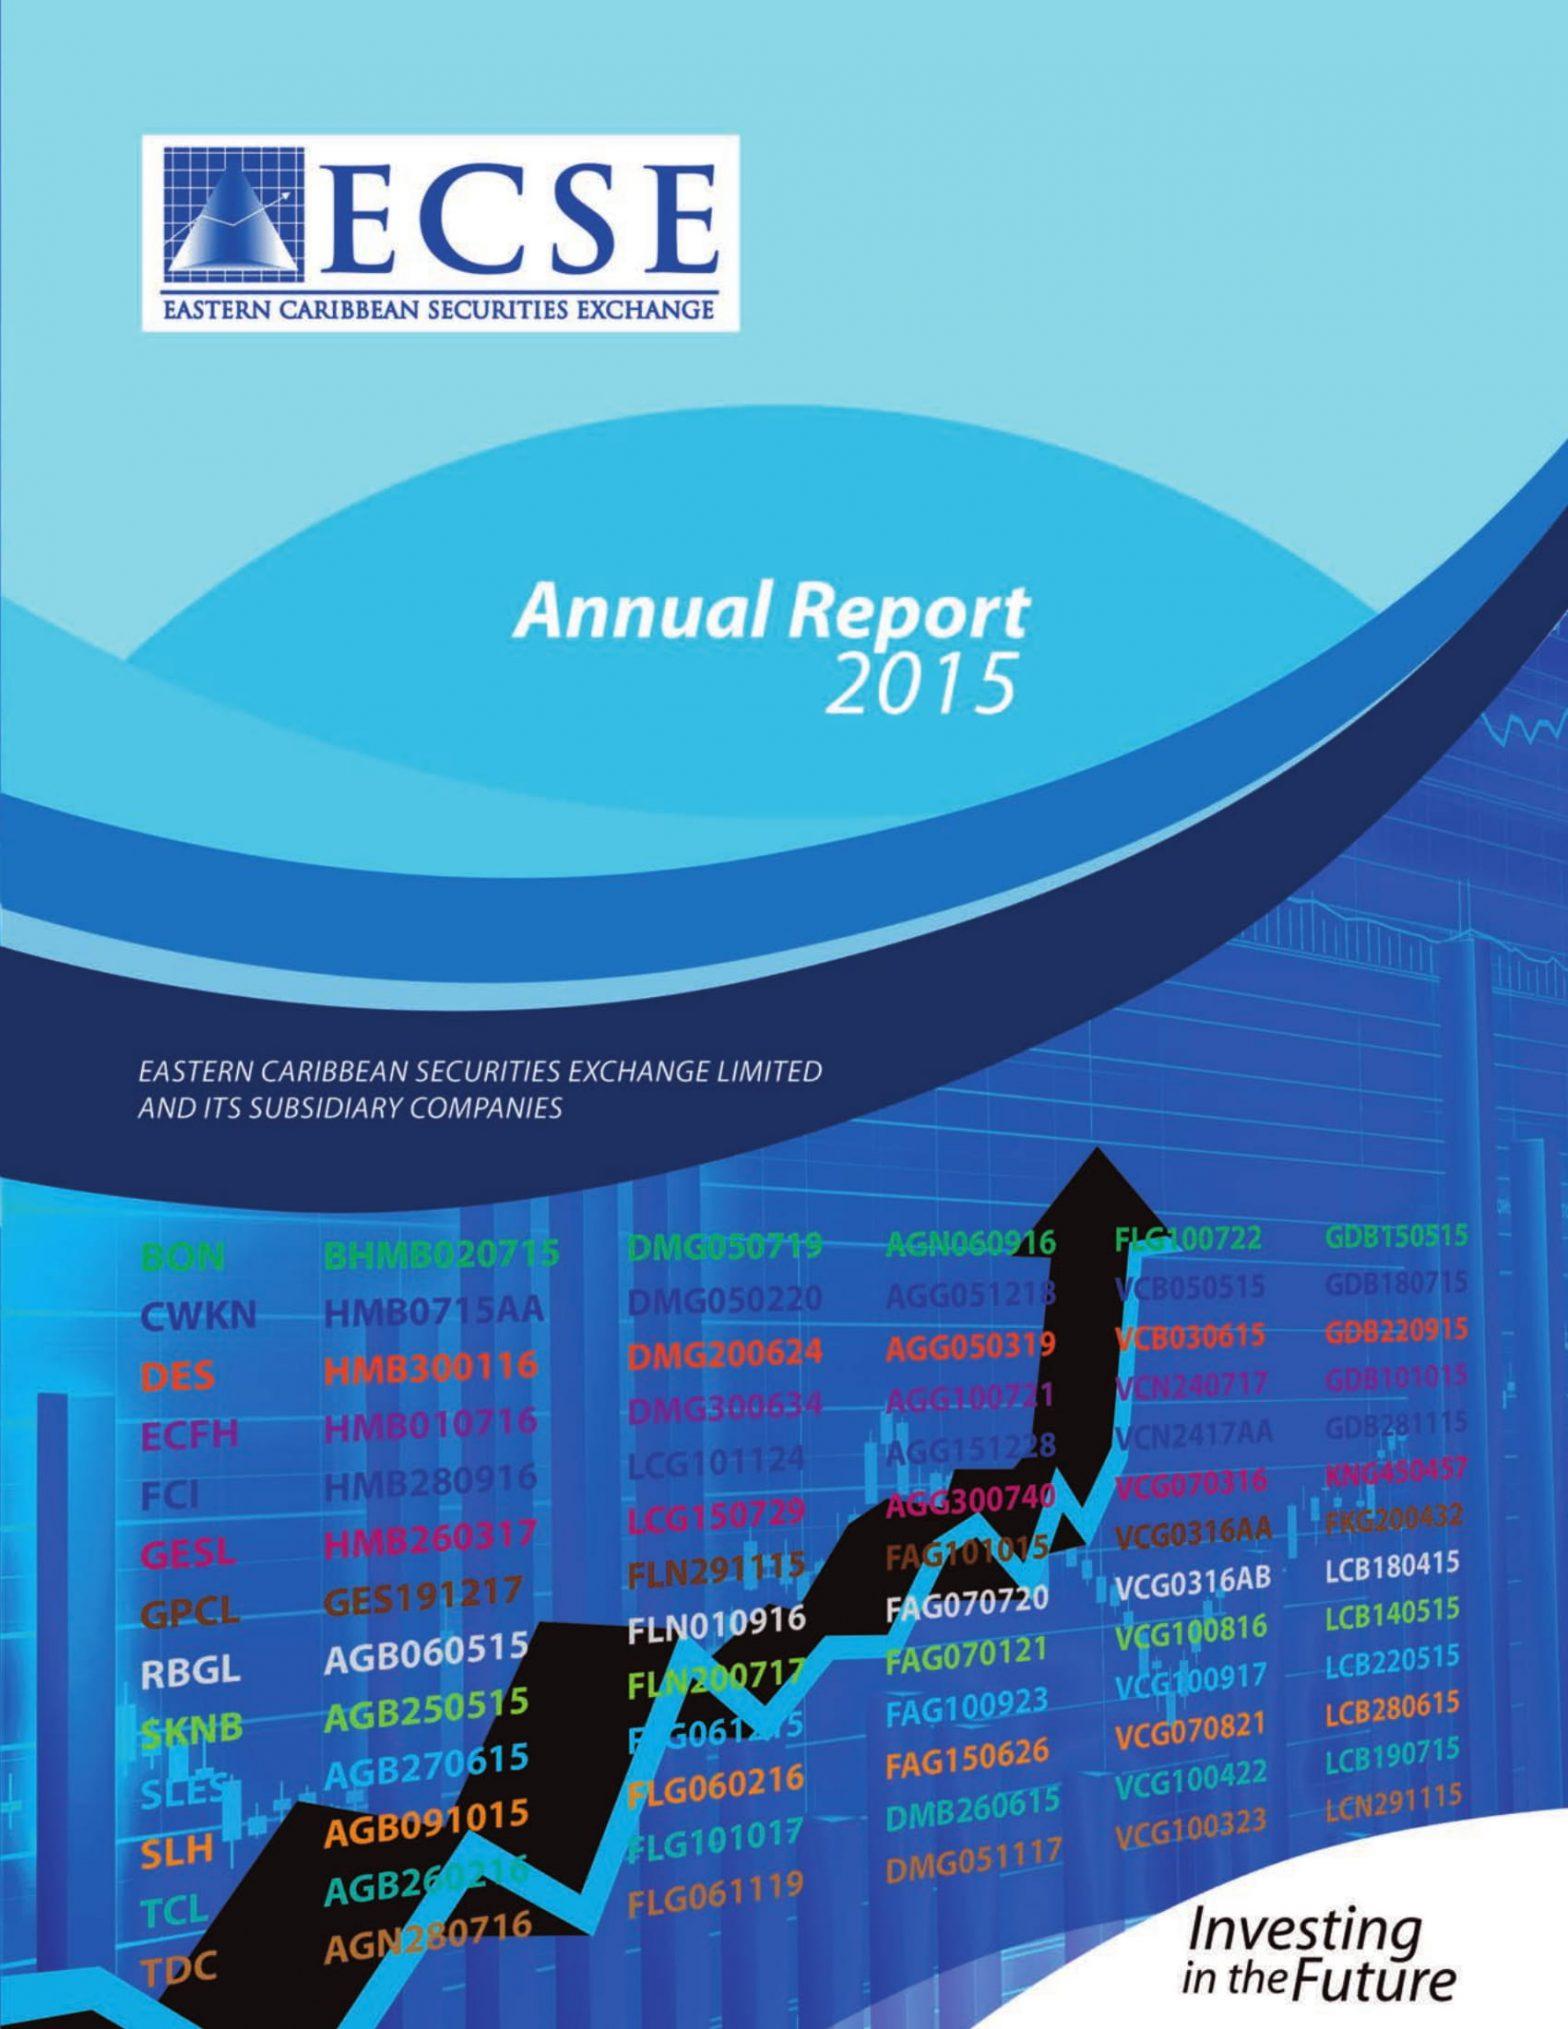 ECSE Annual Report 2015